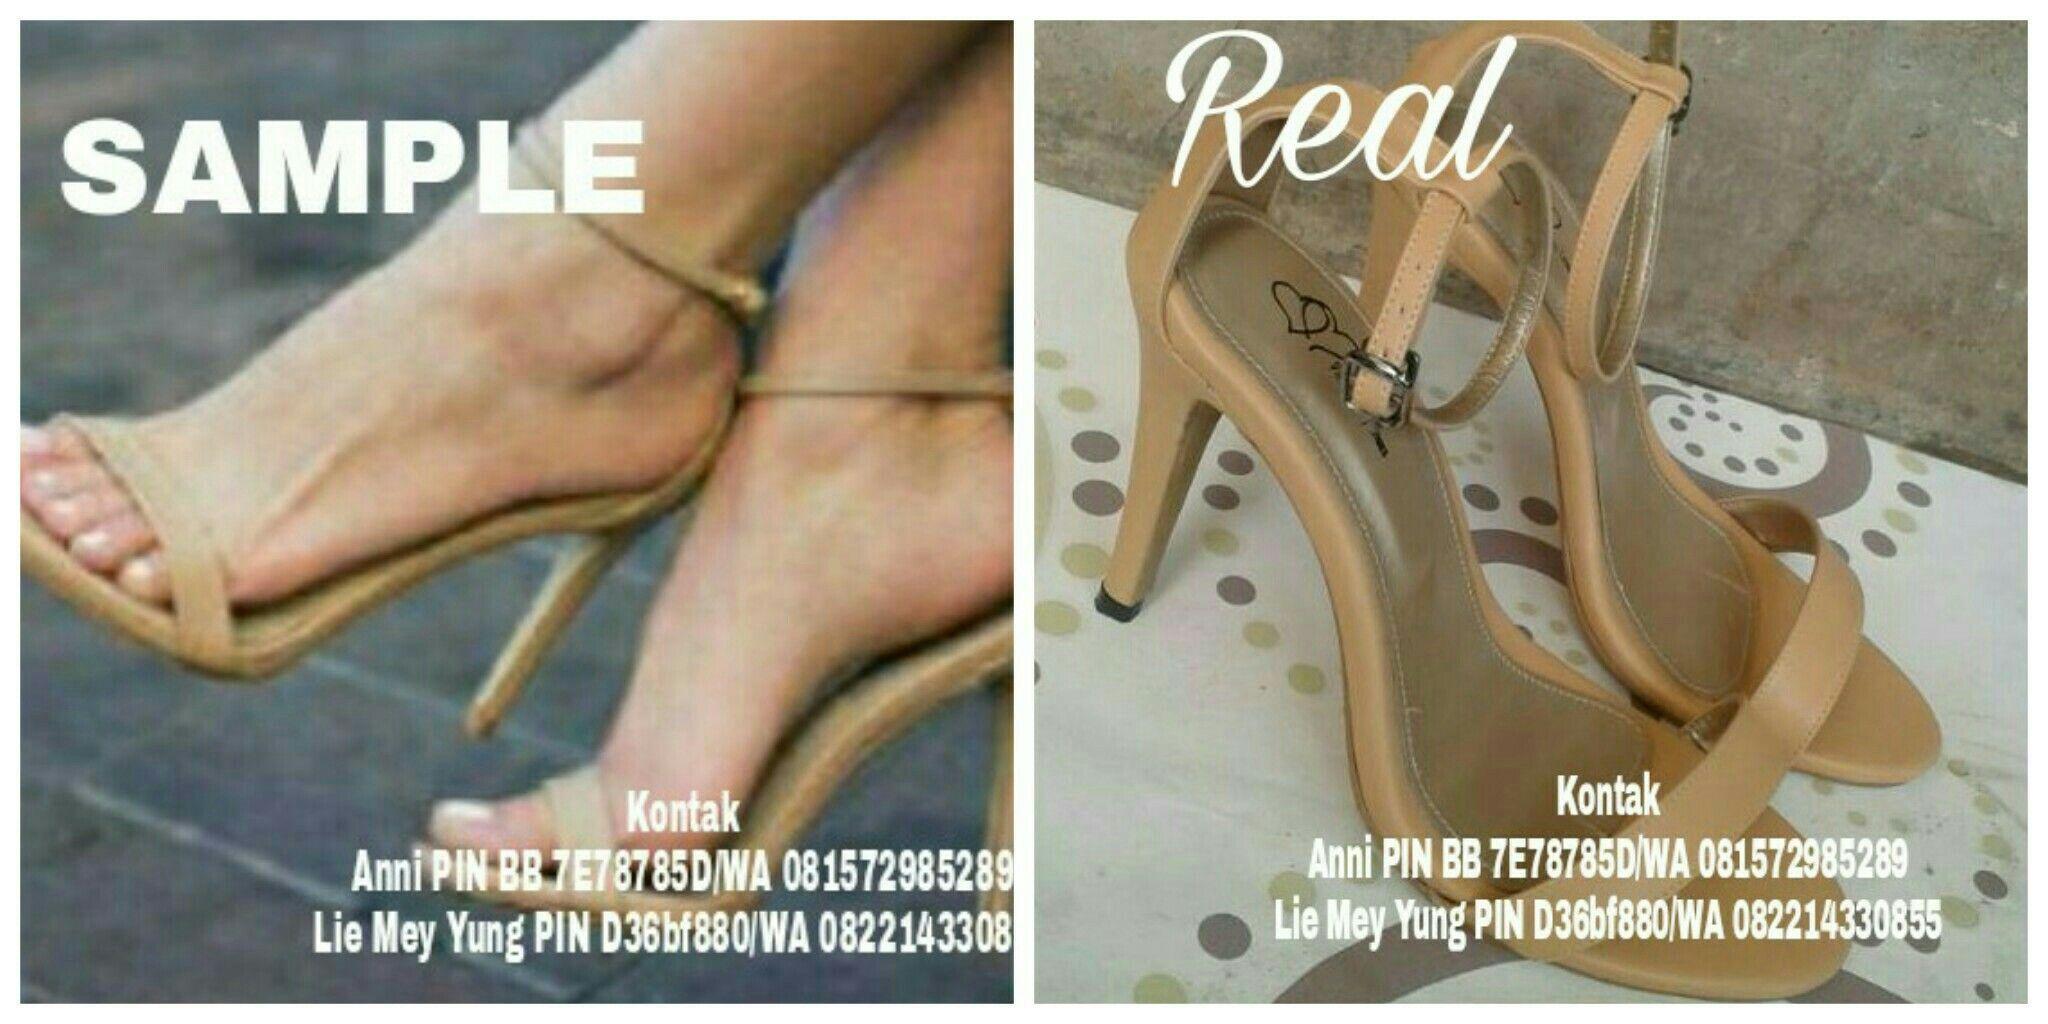 Makloon Sepatu Wanita Satuan Paris Lovely Shoes Kontak Anni Pin